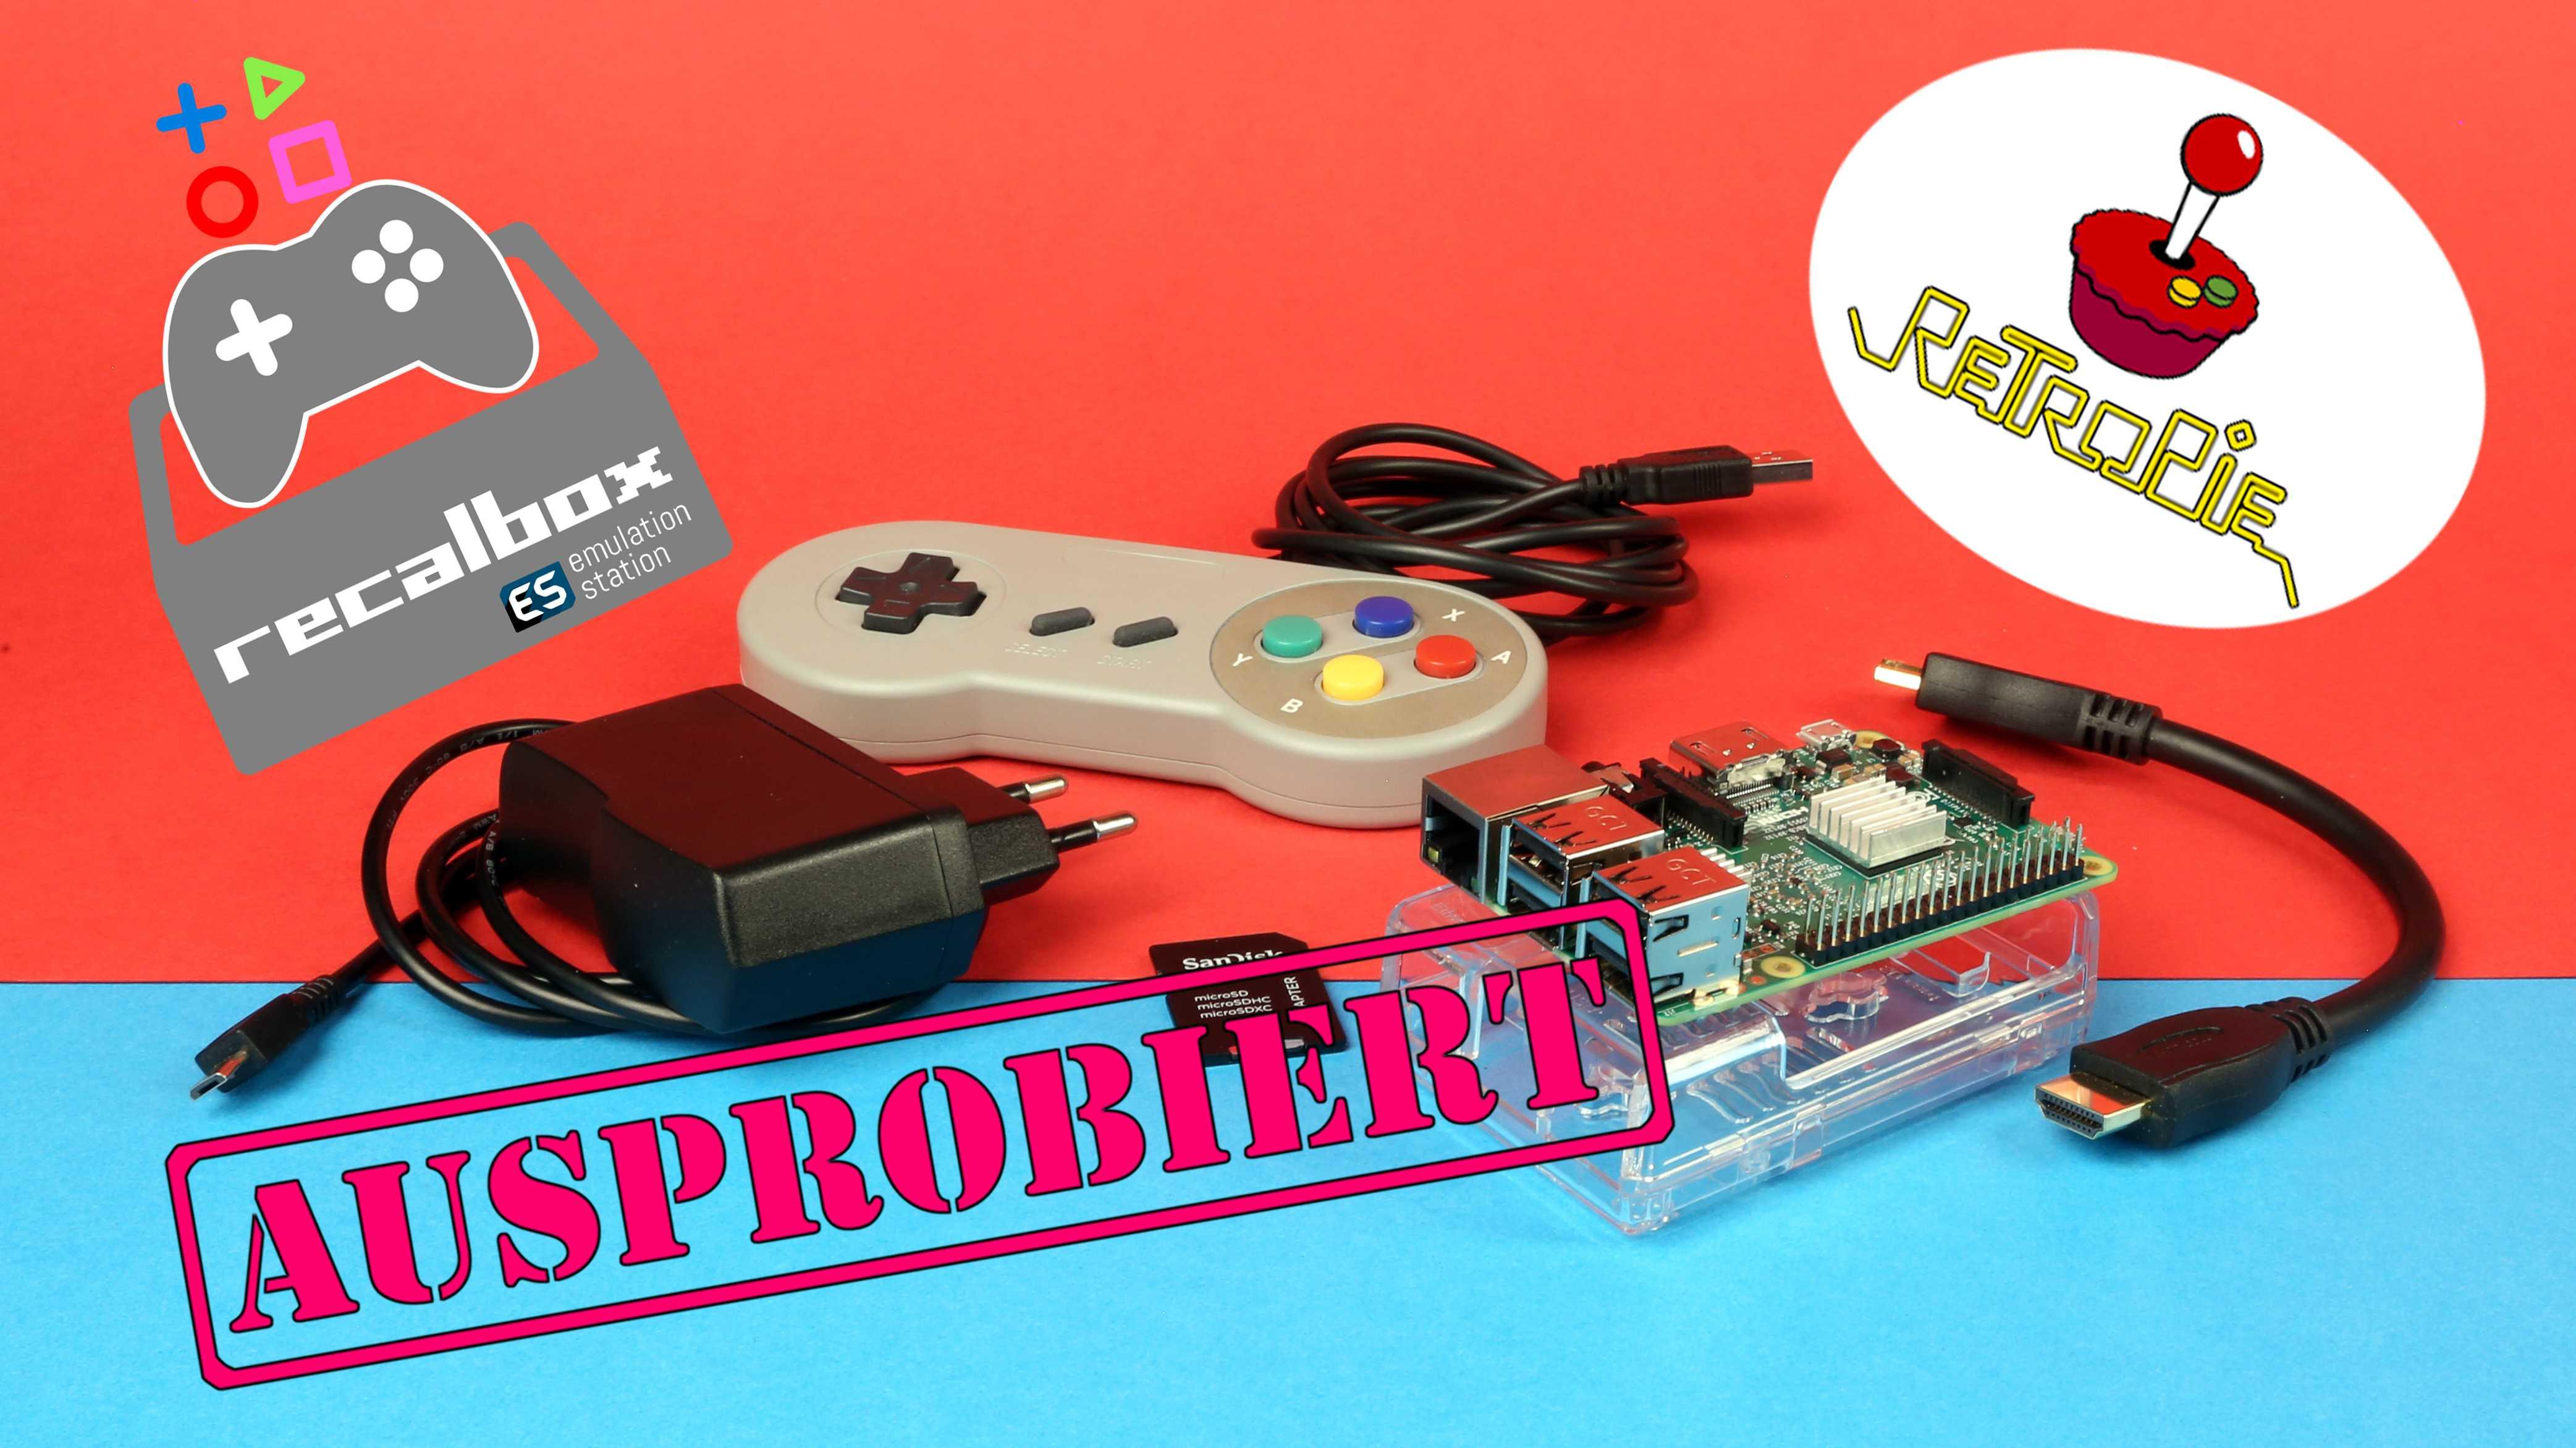 Retrokonsole selber bauen: Recalbox oder Retropie?